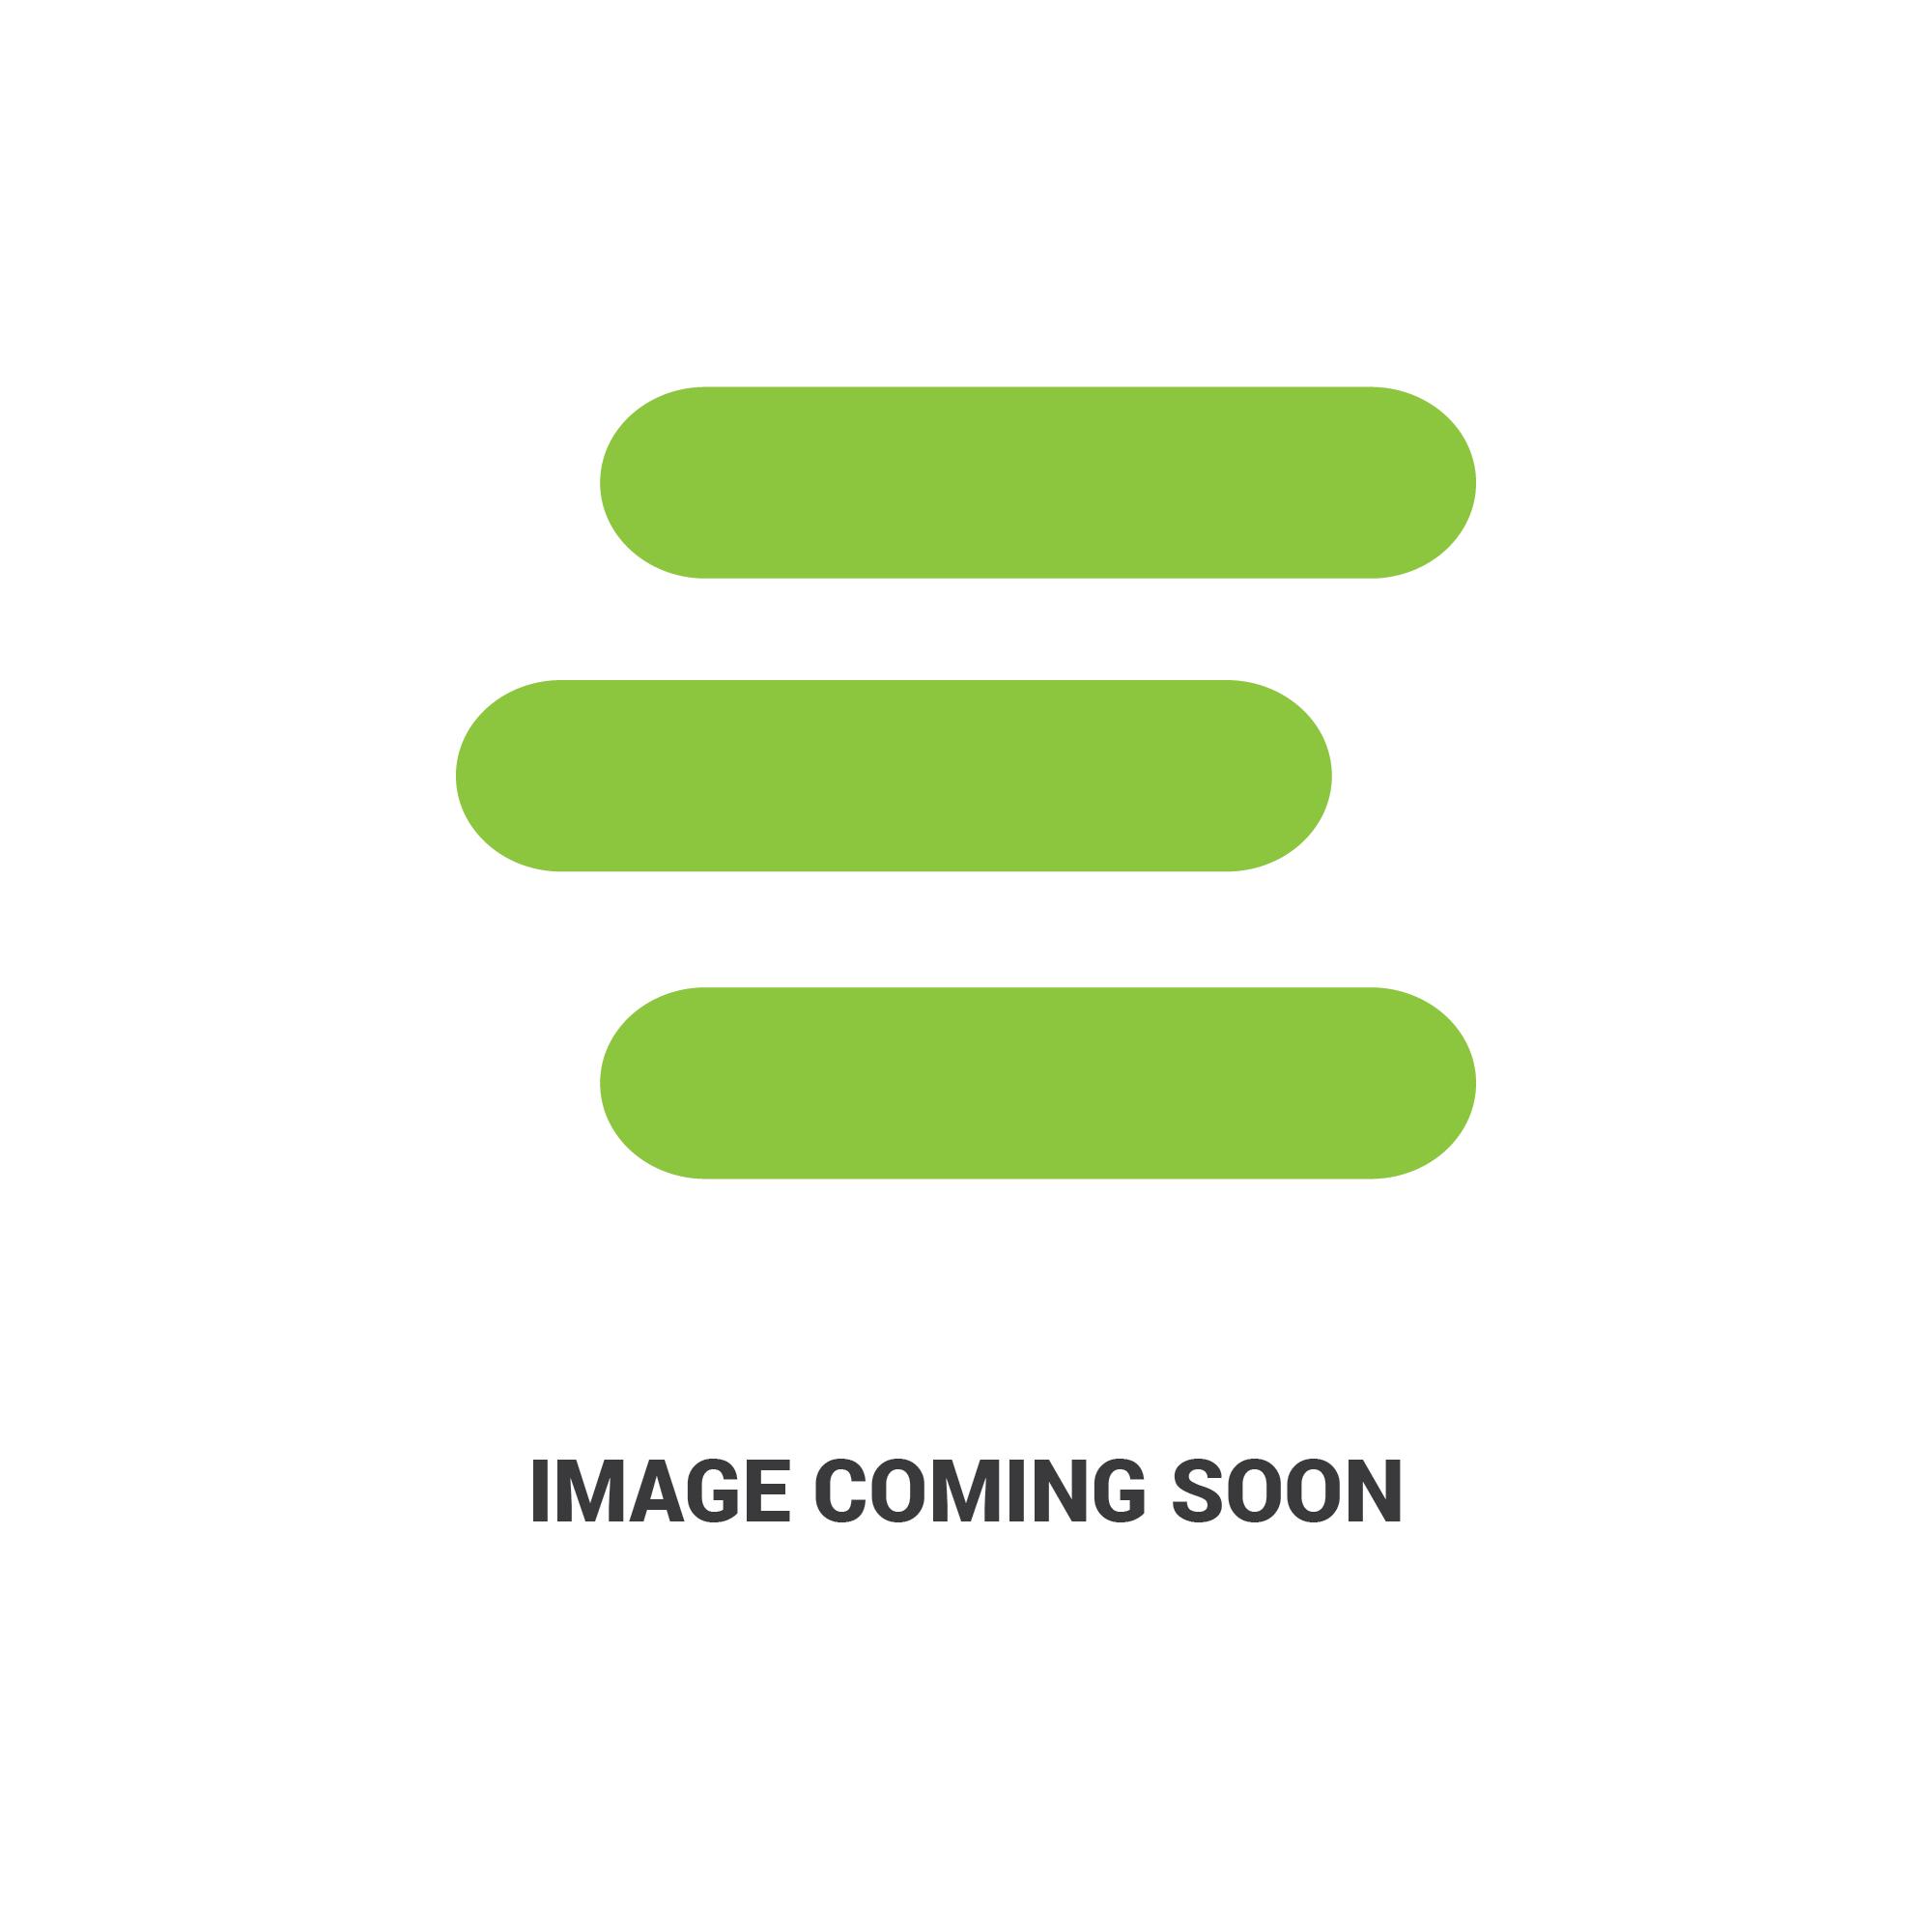 E-6684865edit 1.jpg